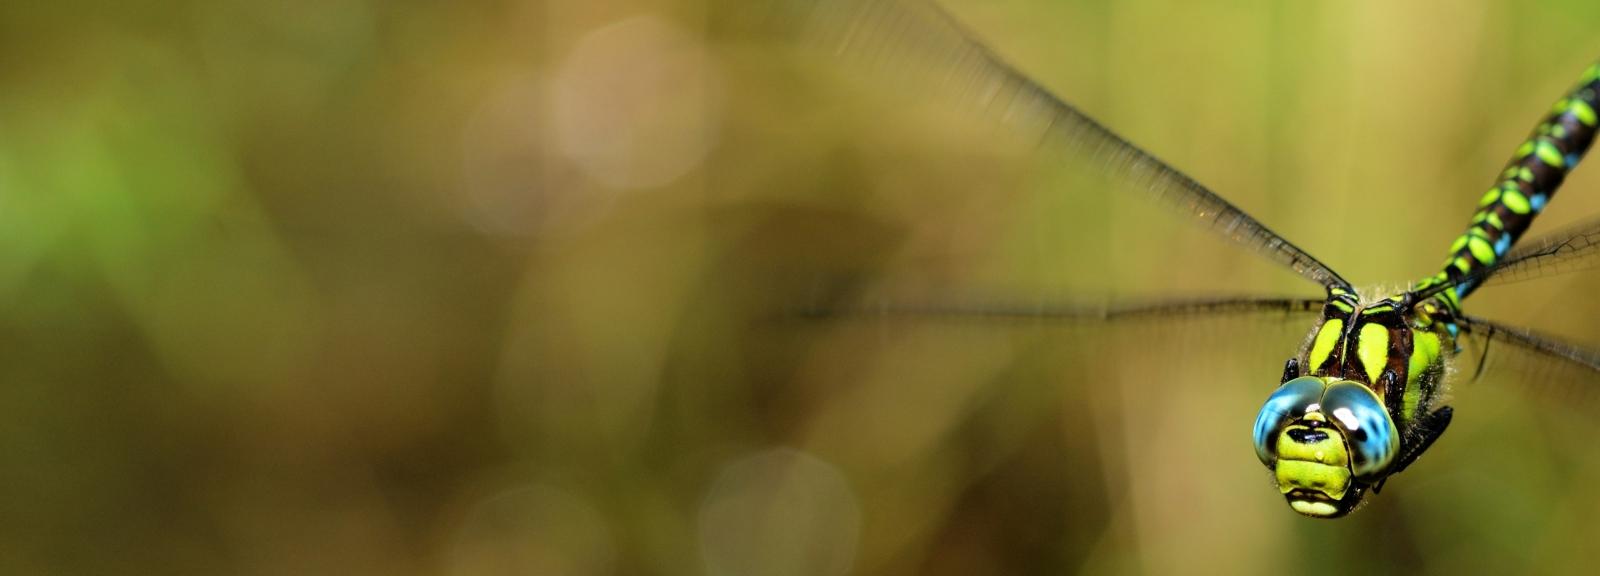 libellule © martin_jeanmougin -mnhn